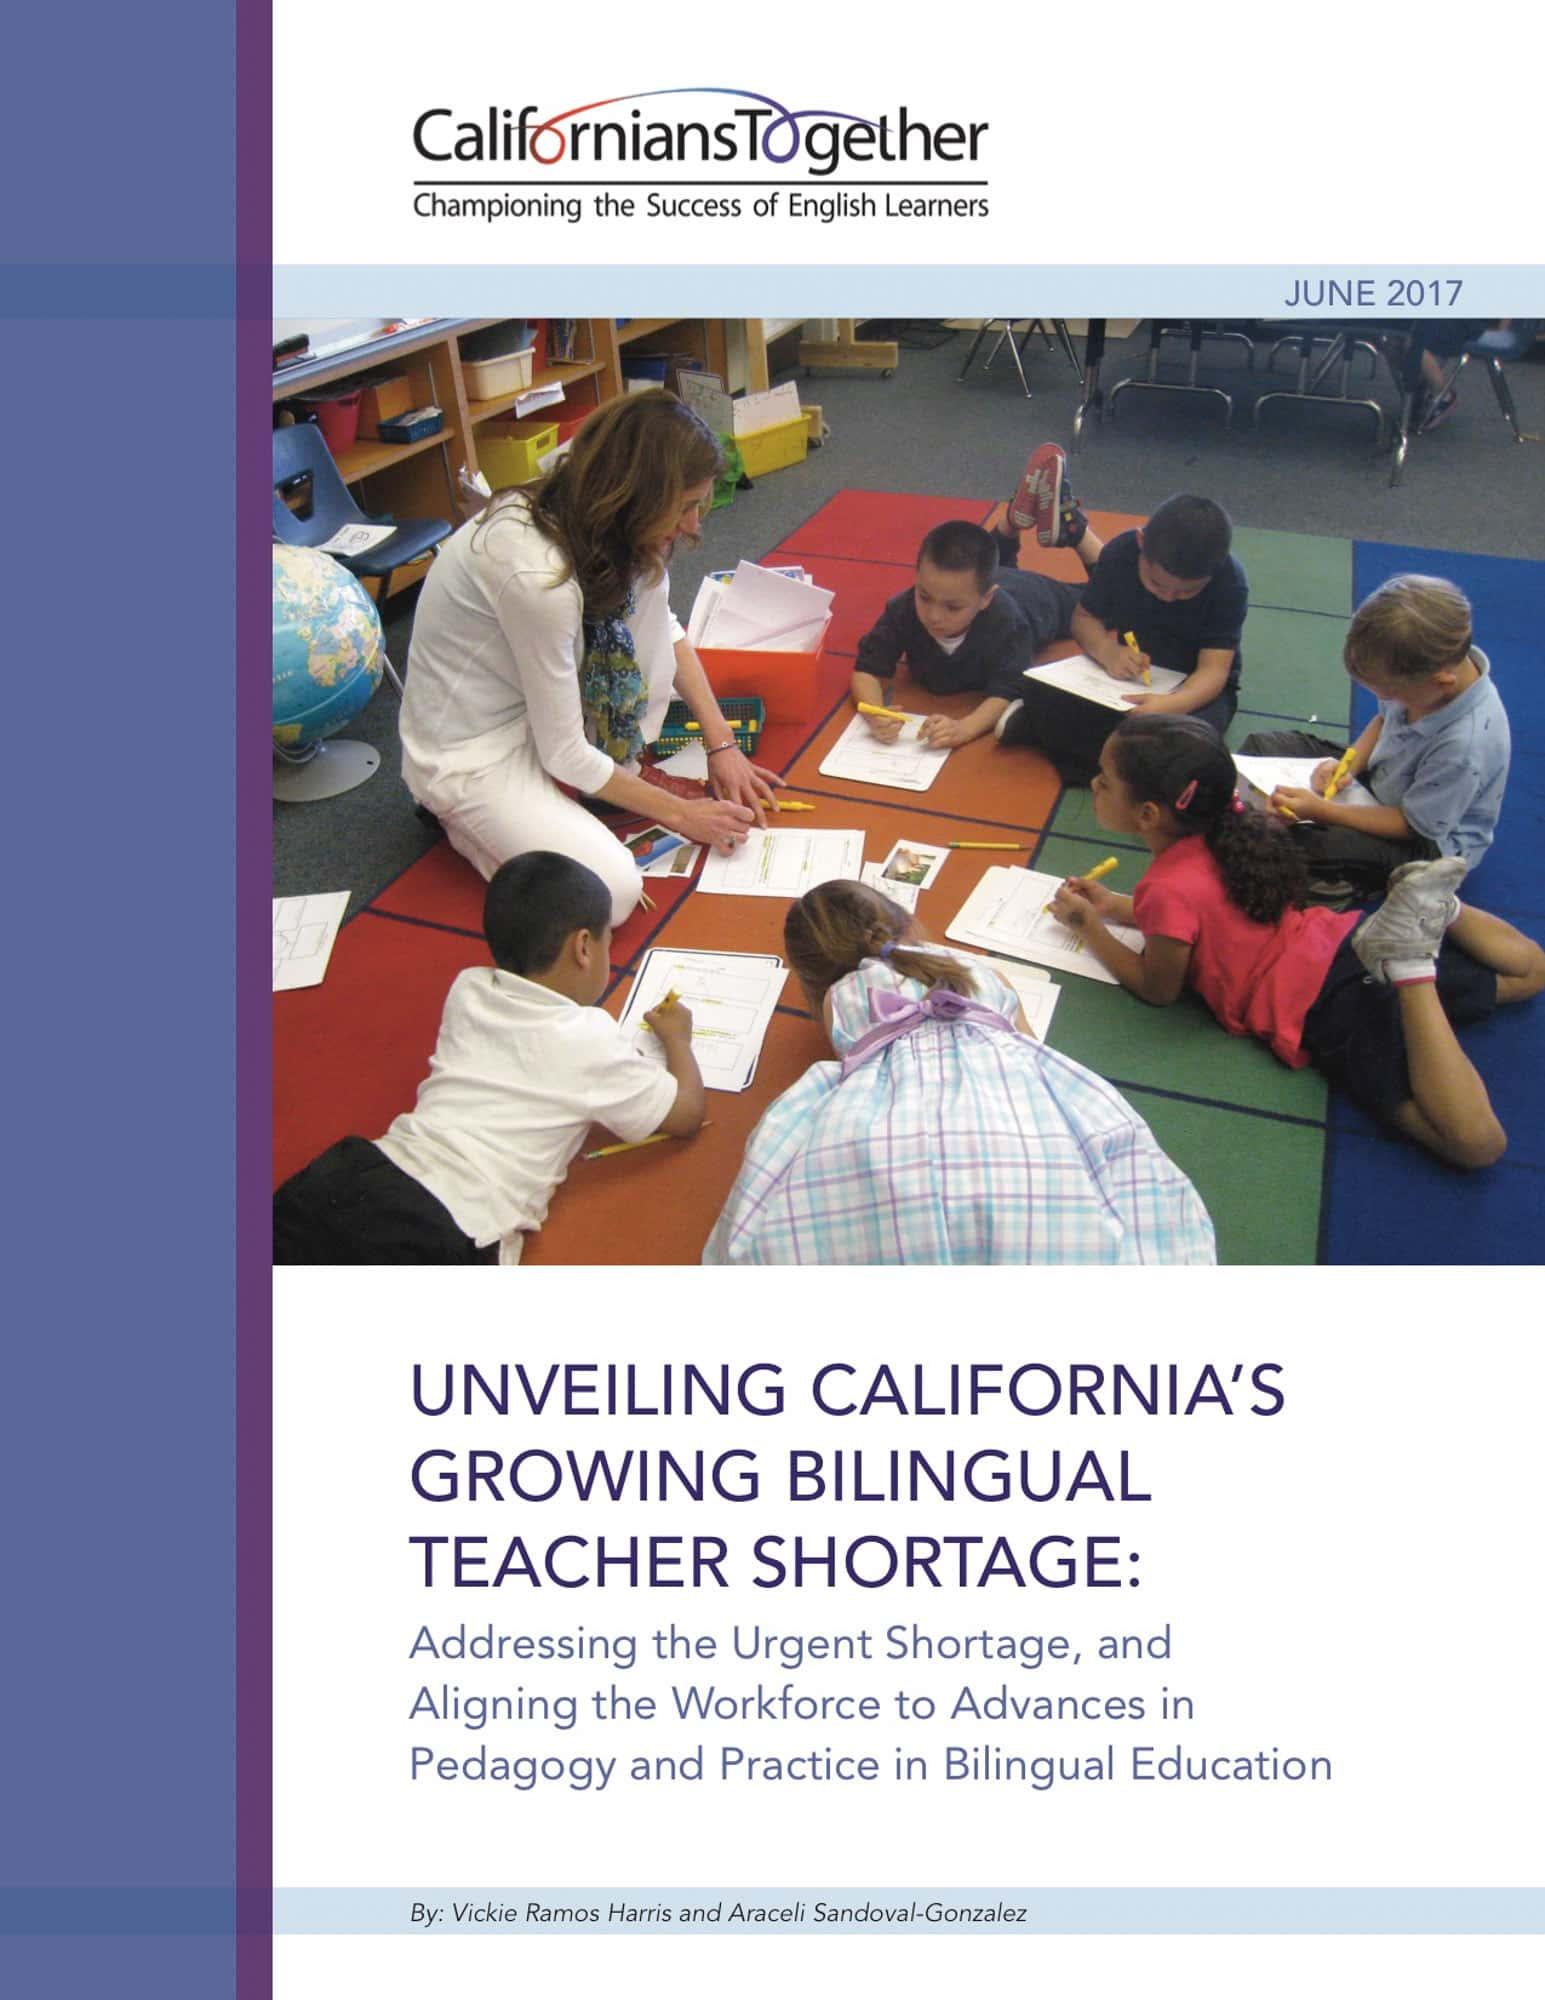 Growing-Bilingual-Teacher-Shortage